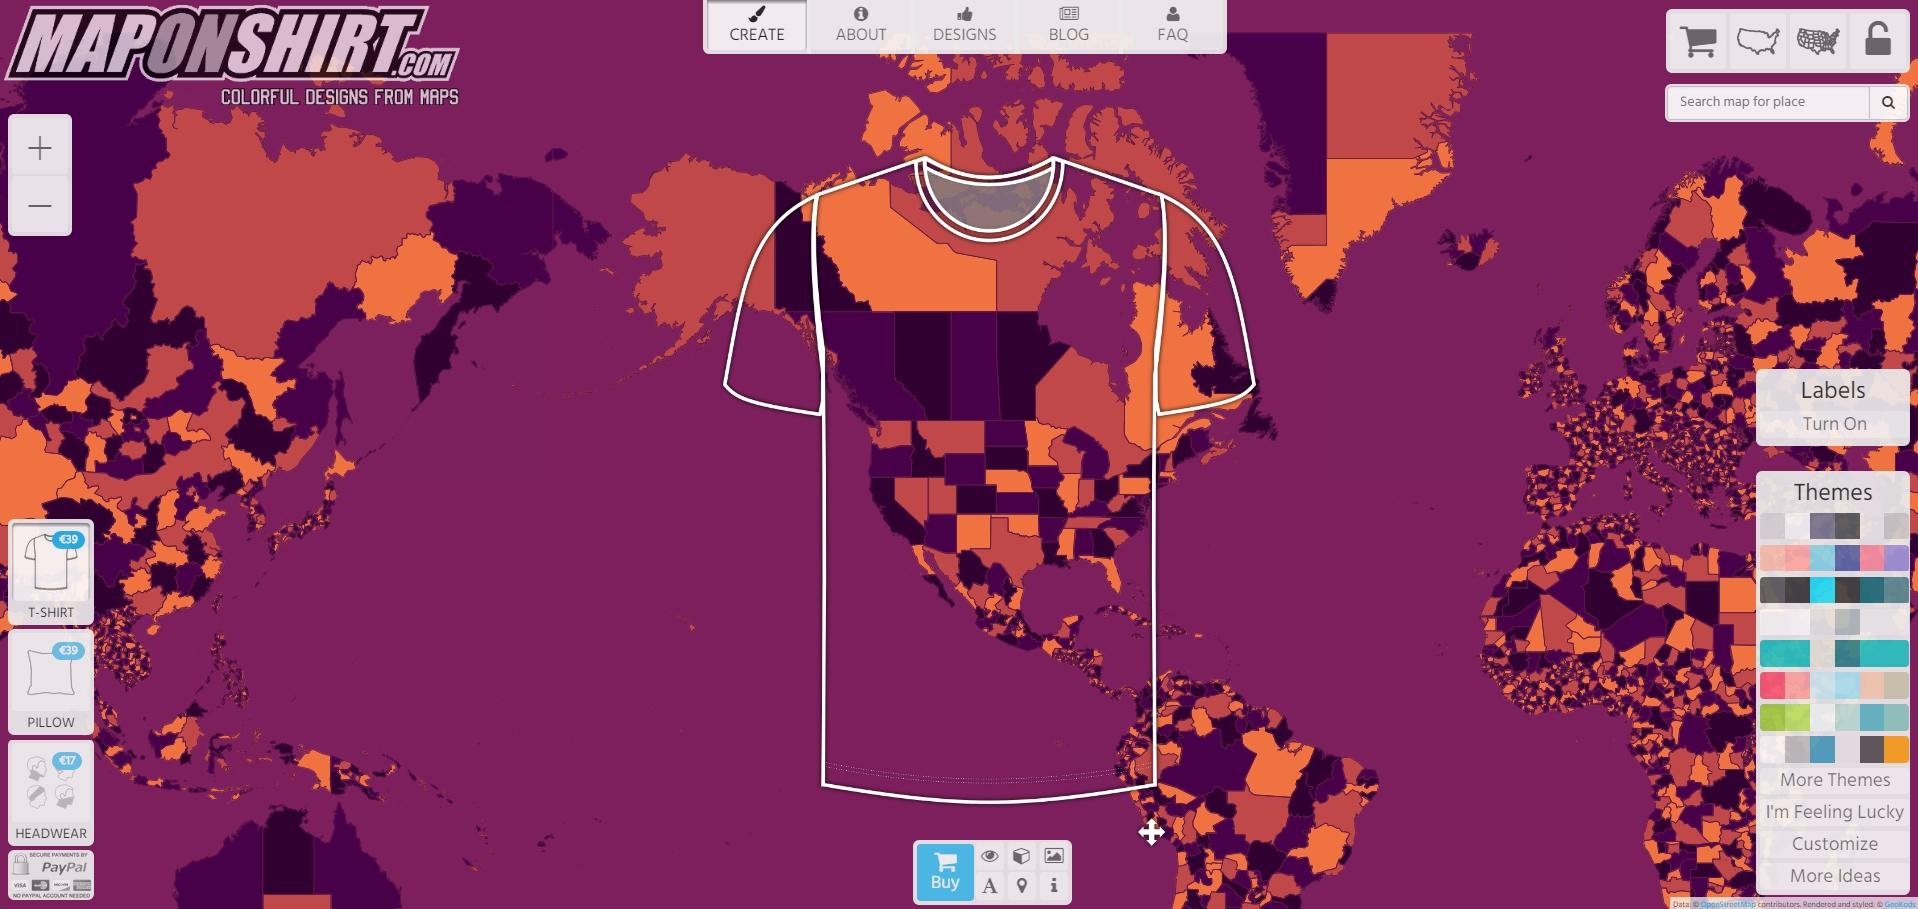 T-shirt design kit free download - Download All Images